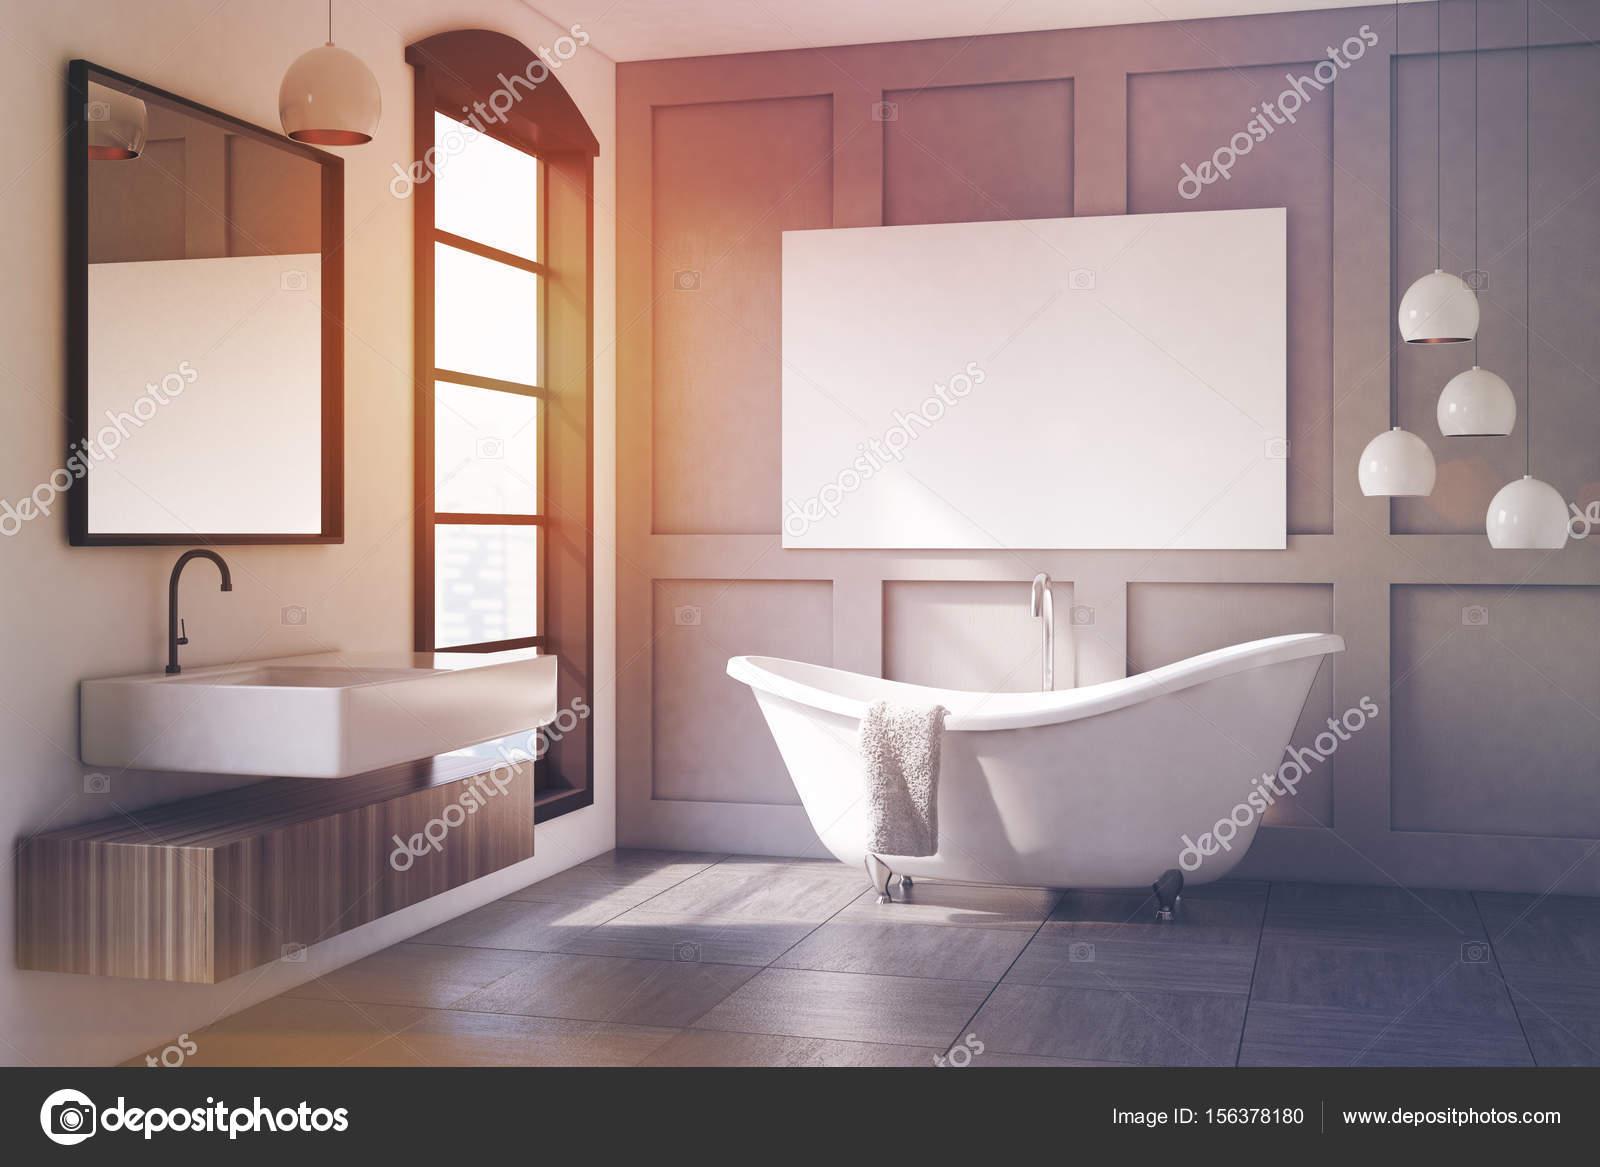 Graue Badezimmer Interieur, Lampe, getönt — Stockfoto ...